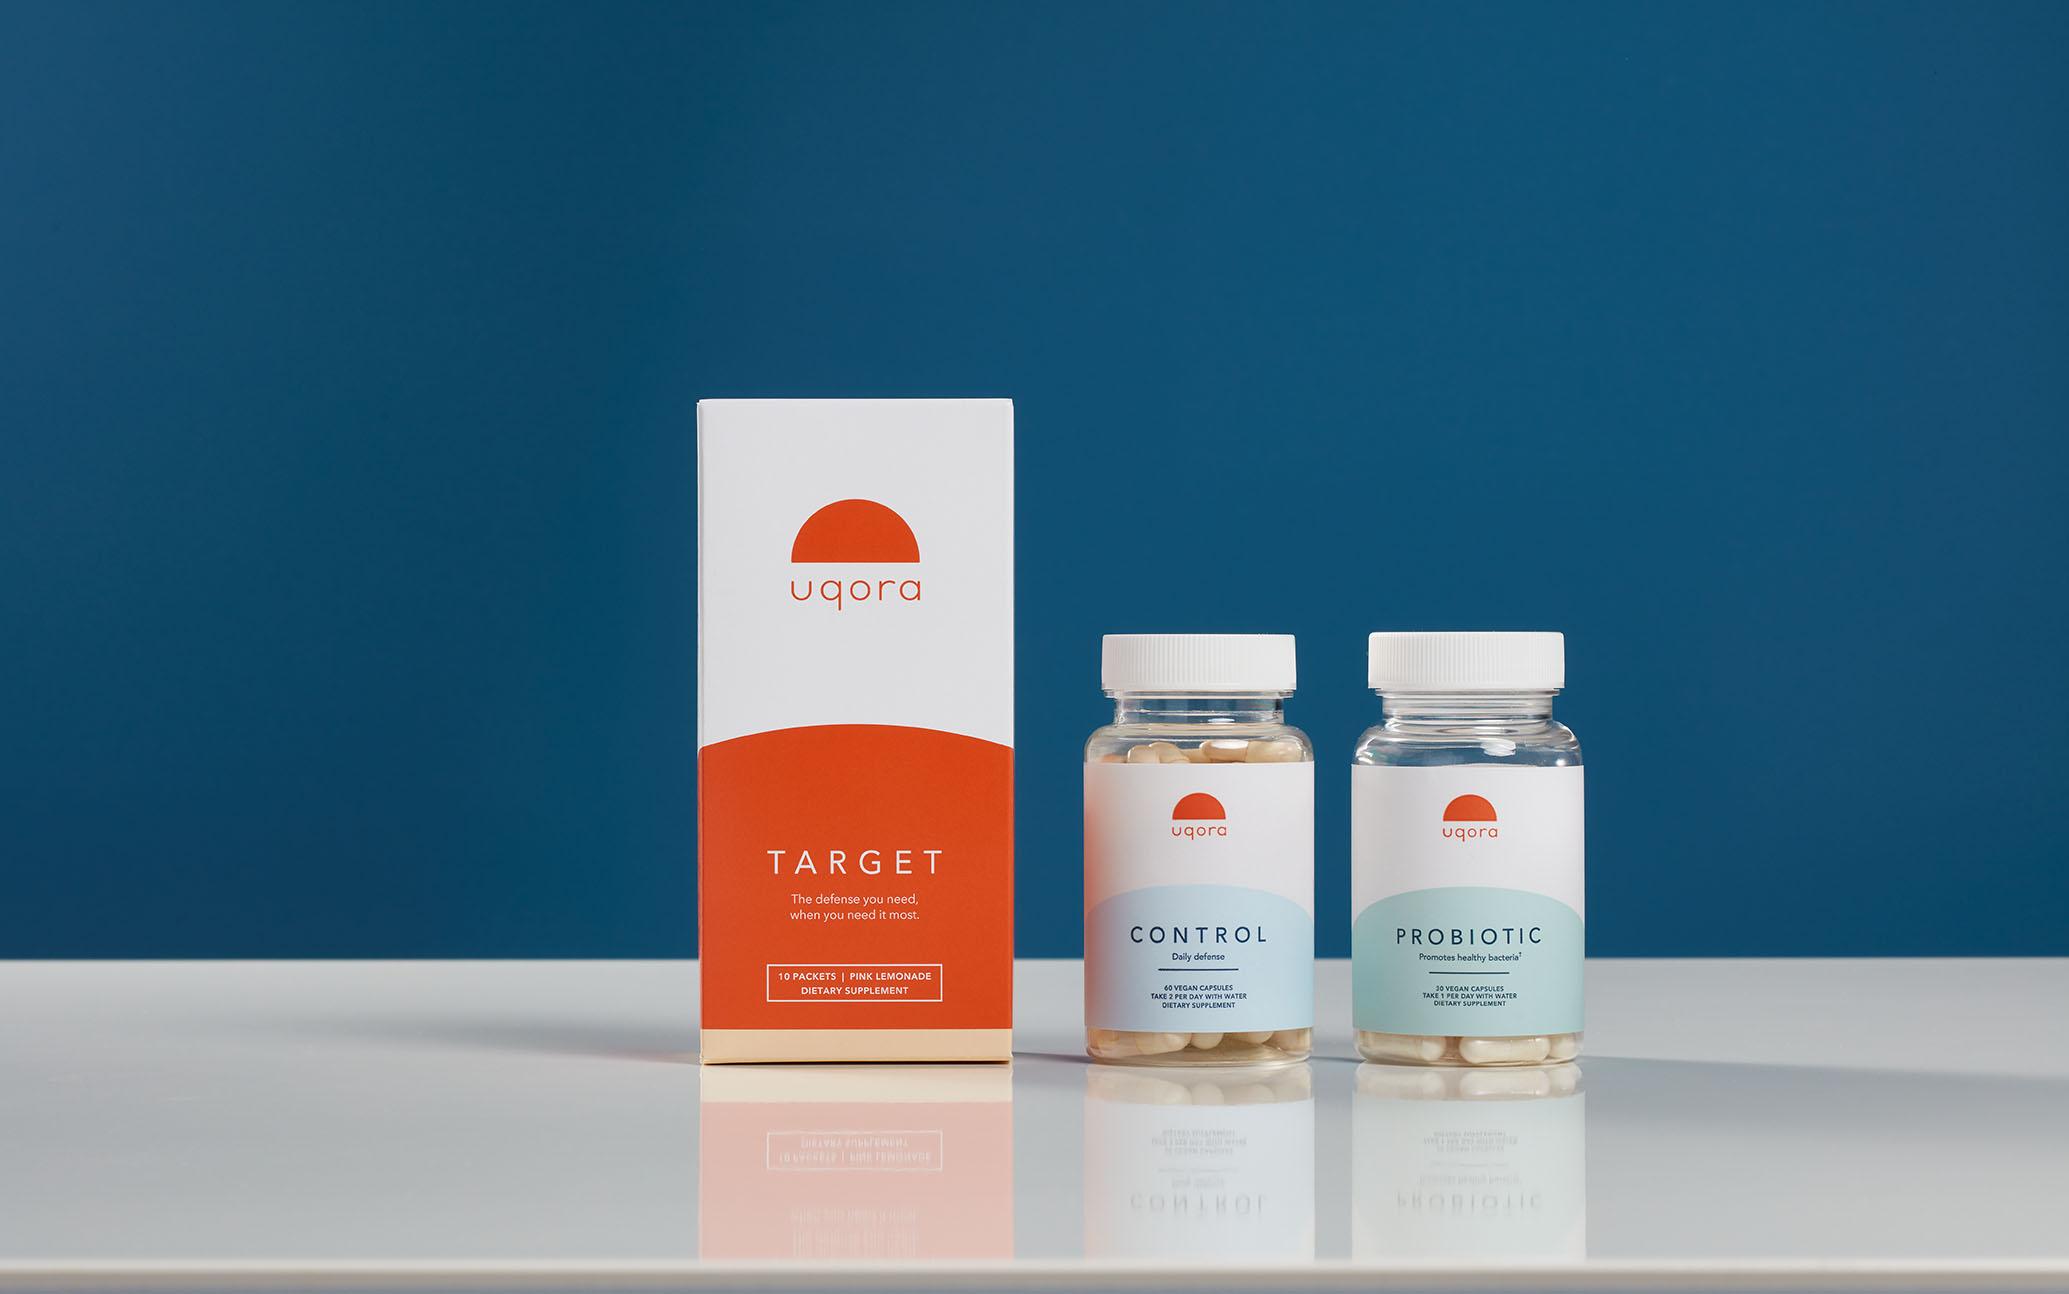 Uqora Target & Control